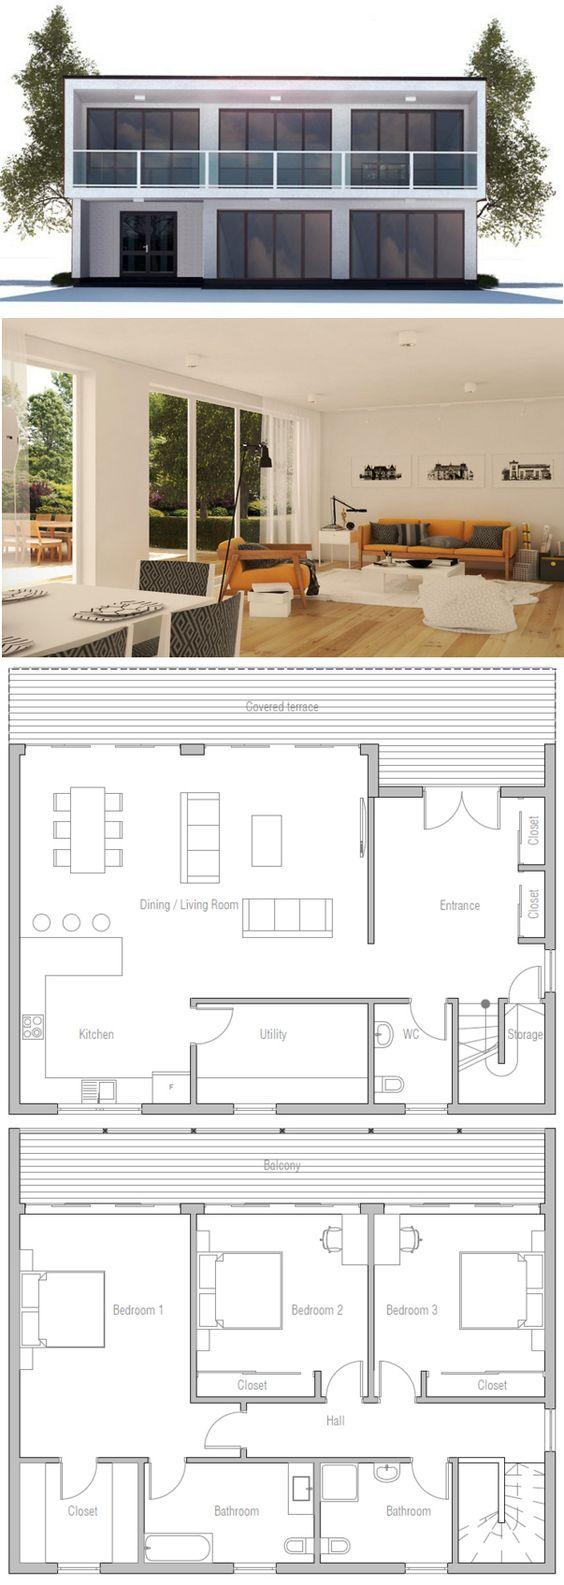 Plan de Maison  dom  Pinterest  Moderne Home Pläne, Moderne ... size: 564 x 1585 post ID: 1 File size: 0 B